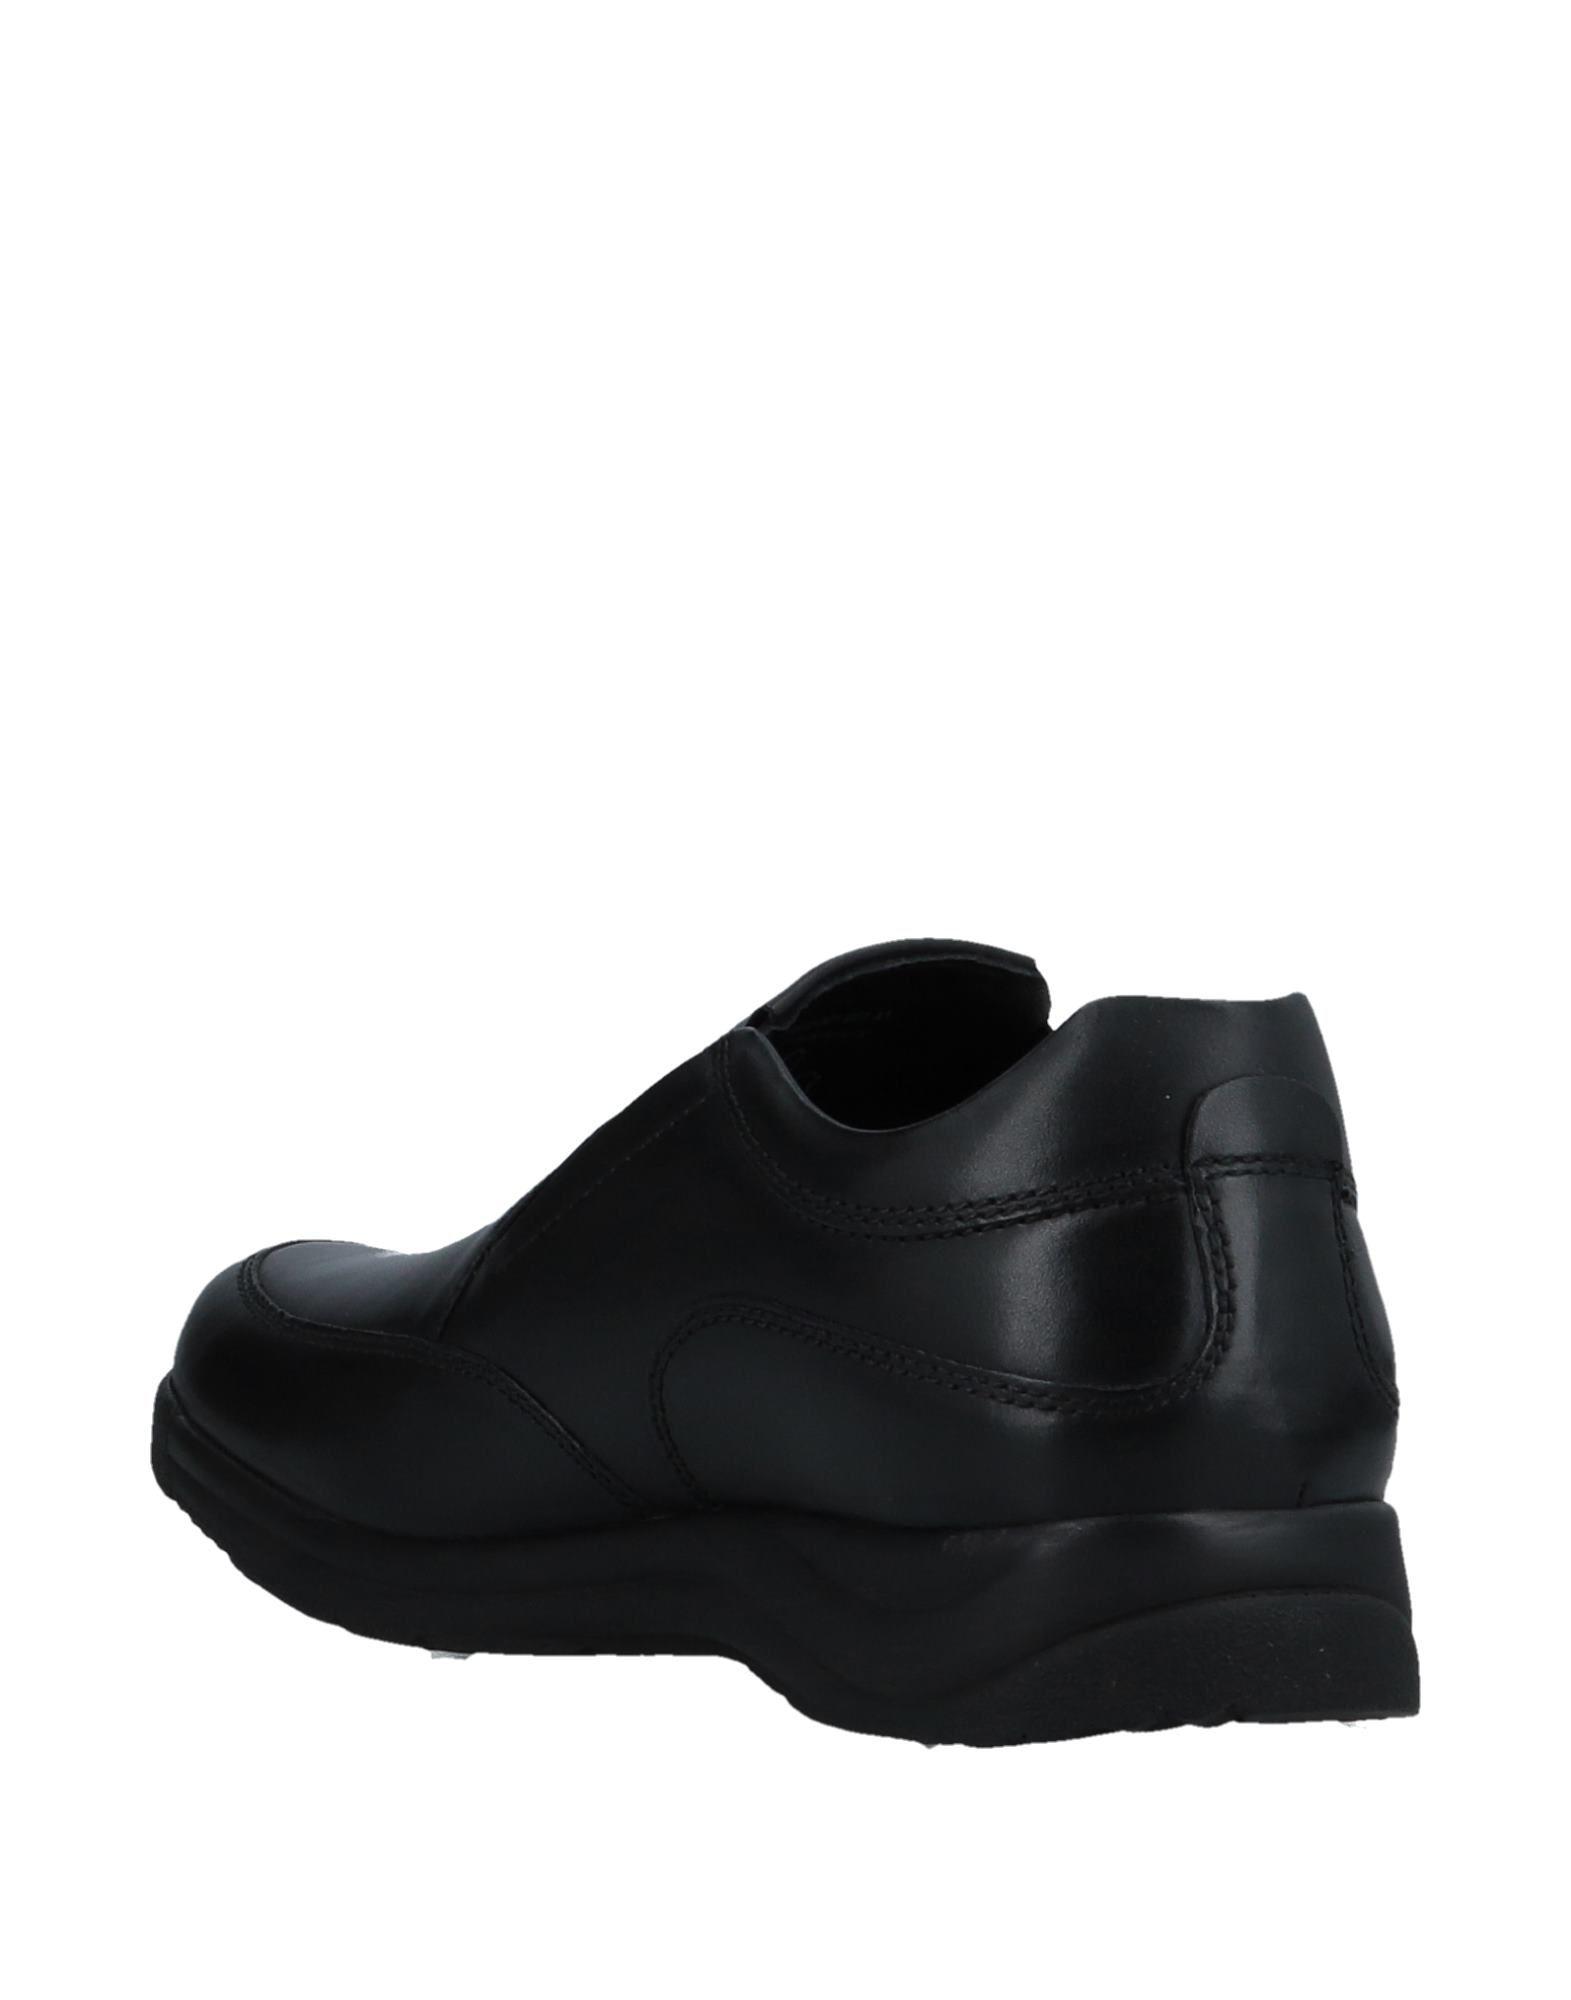 A buon mercato Sneakers Lumberjack Uomo - 11505638TL